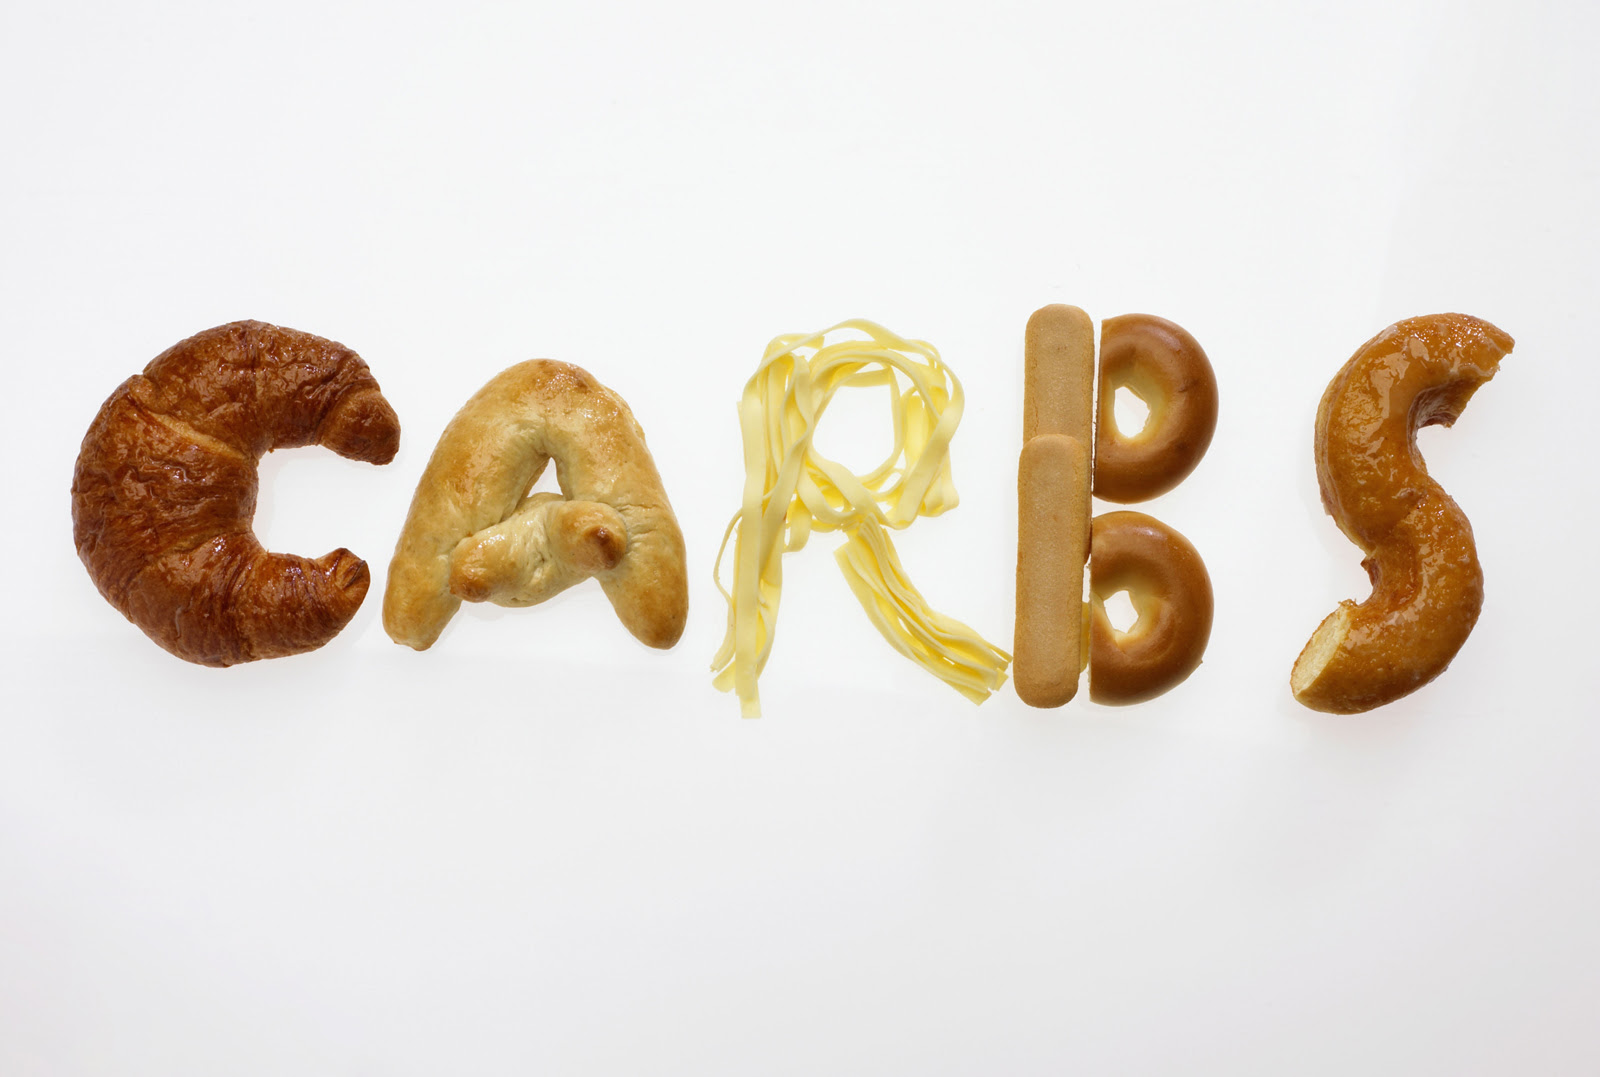 carbohydrates, cheap food, cheap bodybuilding, budget, adam foster, shreddybrek